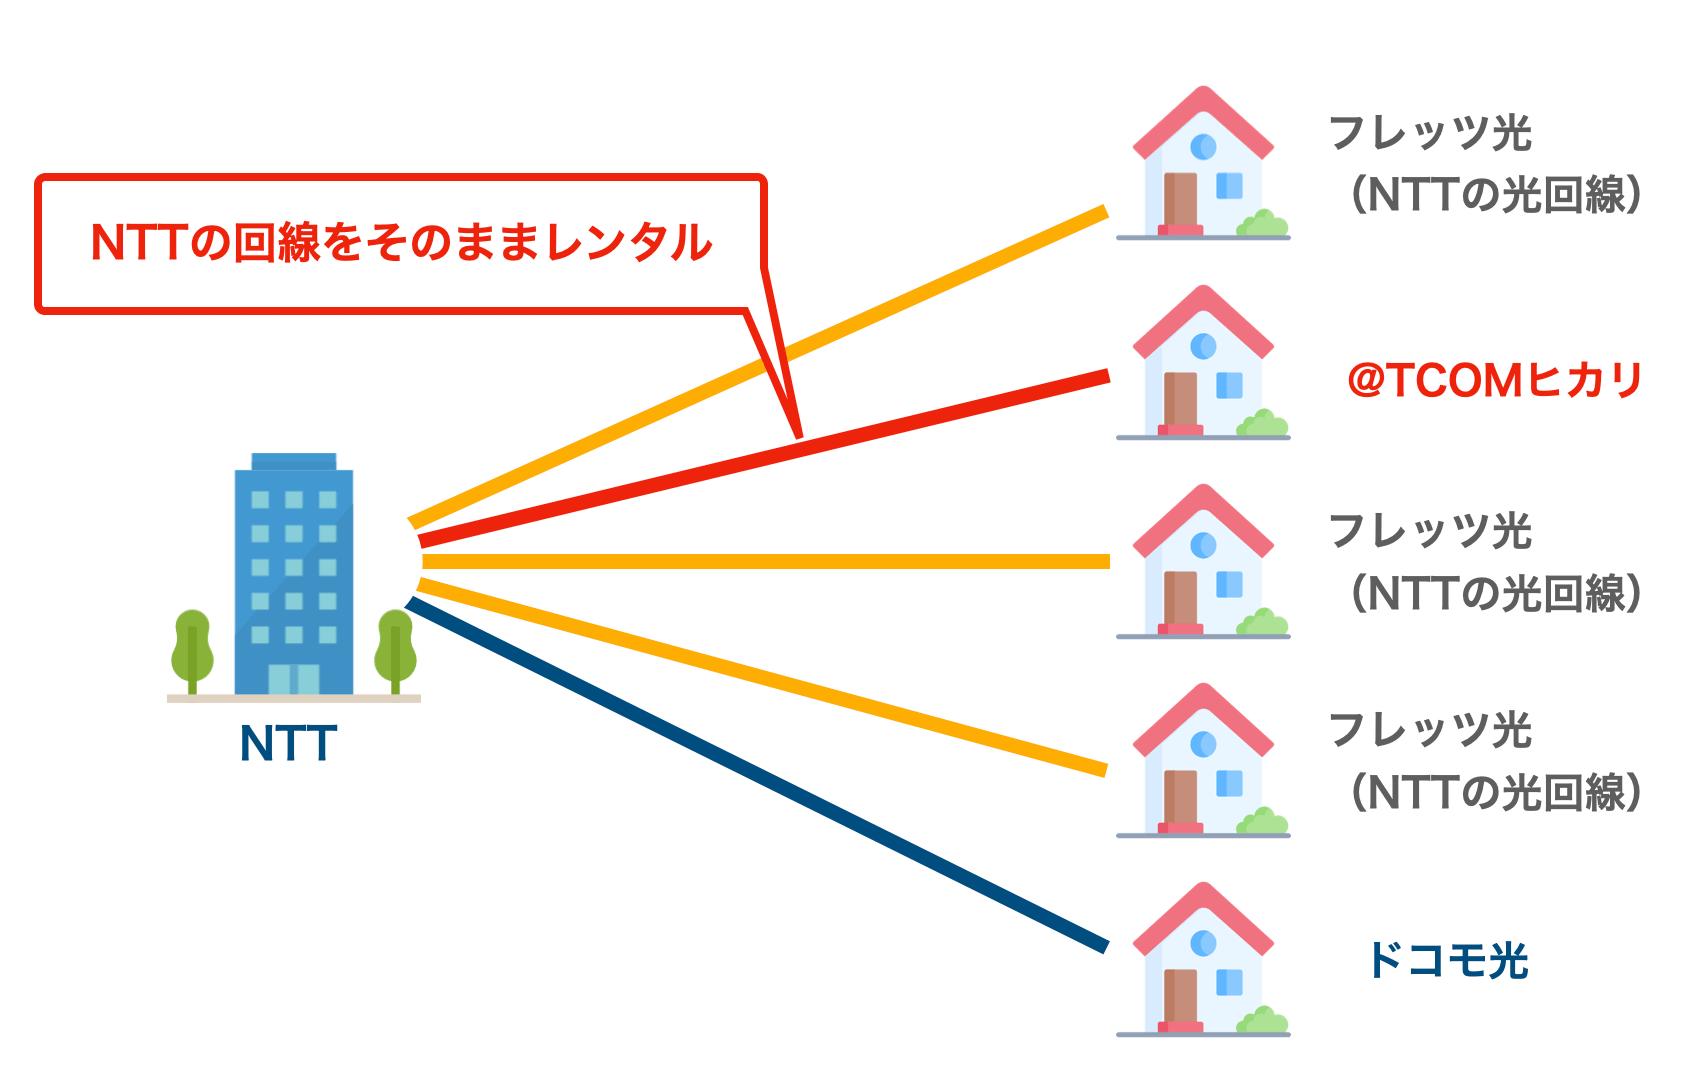 NTT回線を使う光回線